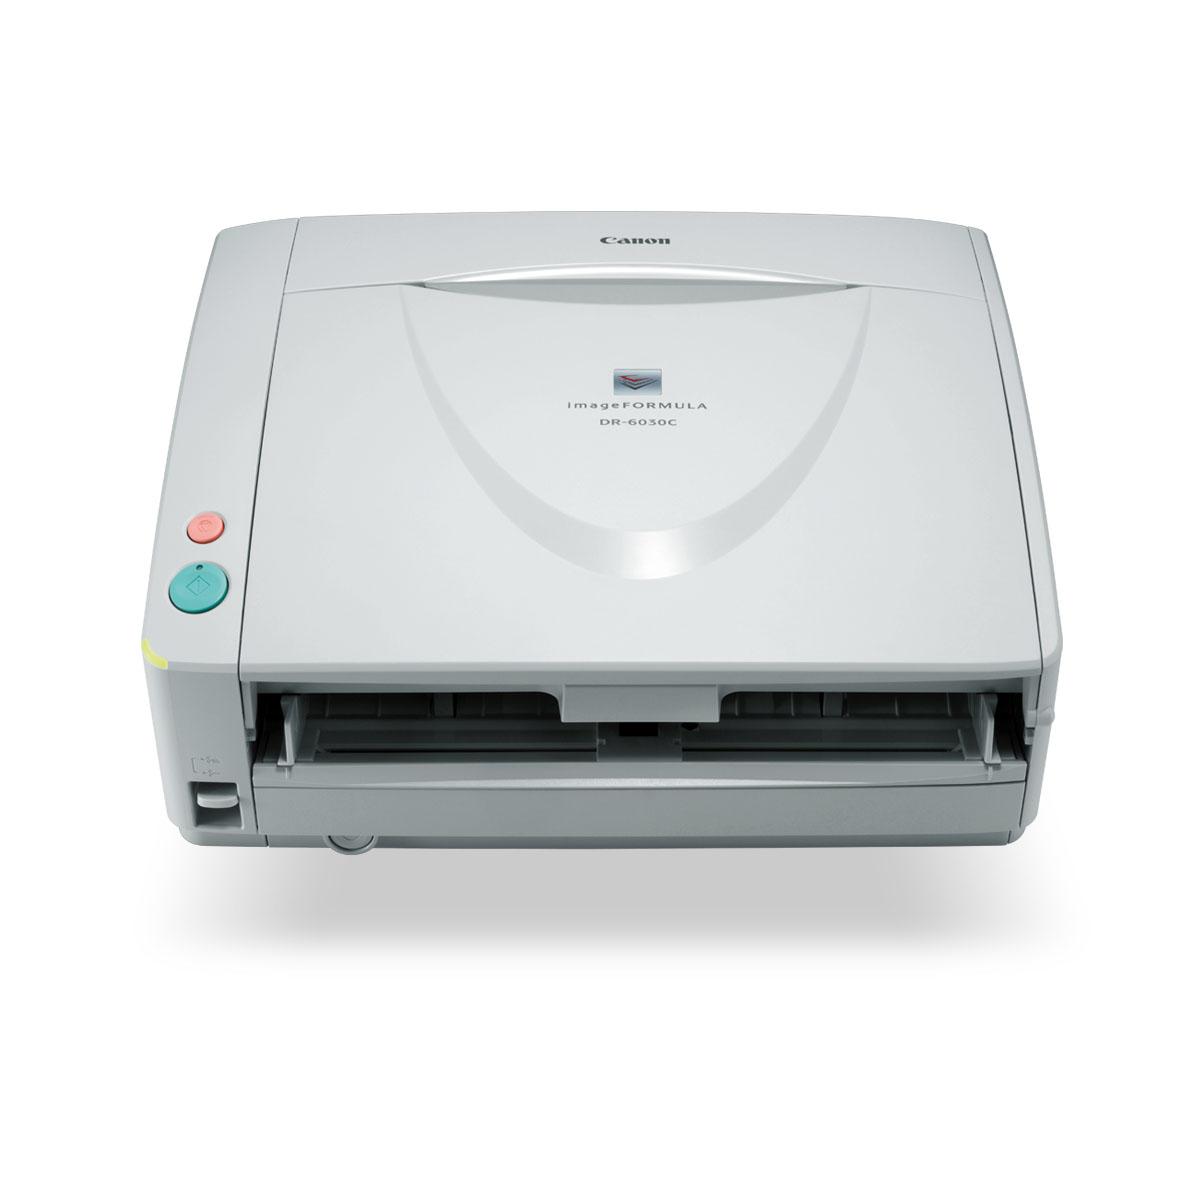 Canon  Products Document Scanners | imageFORMULA imageFORMULA DR-6030C